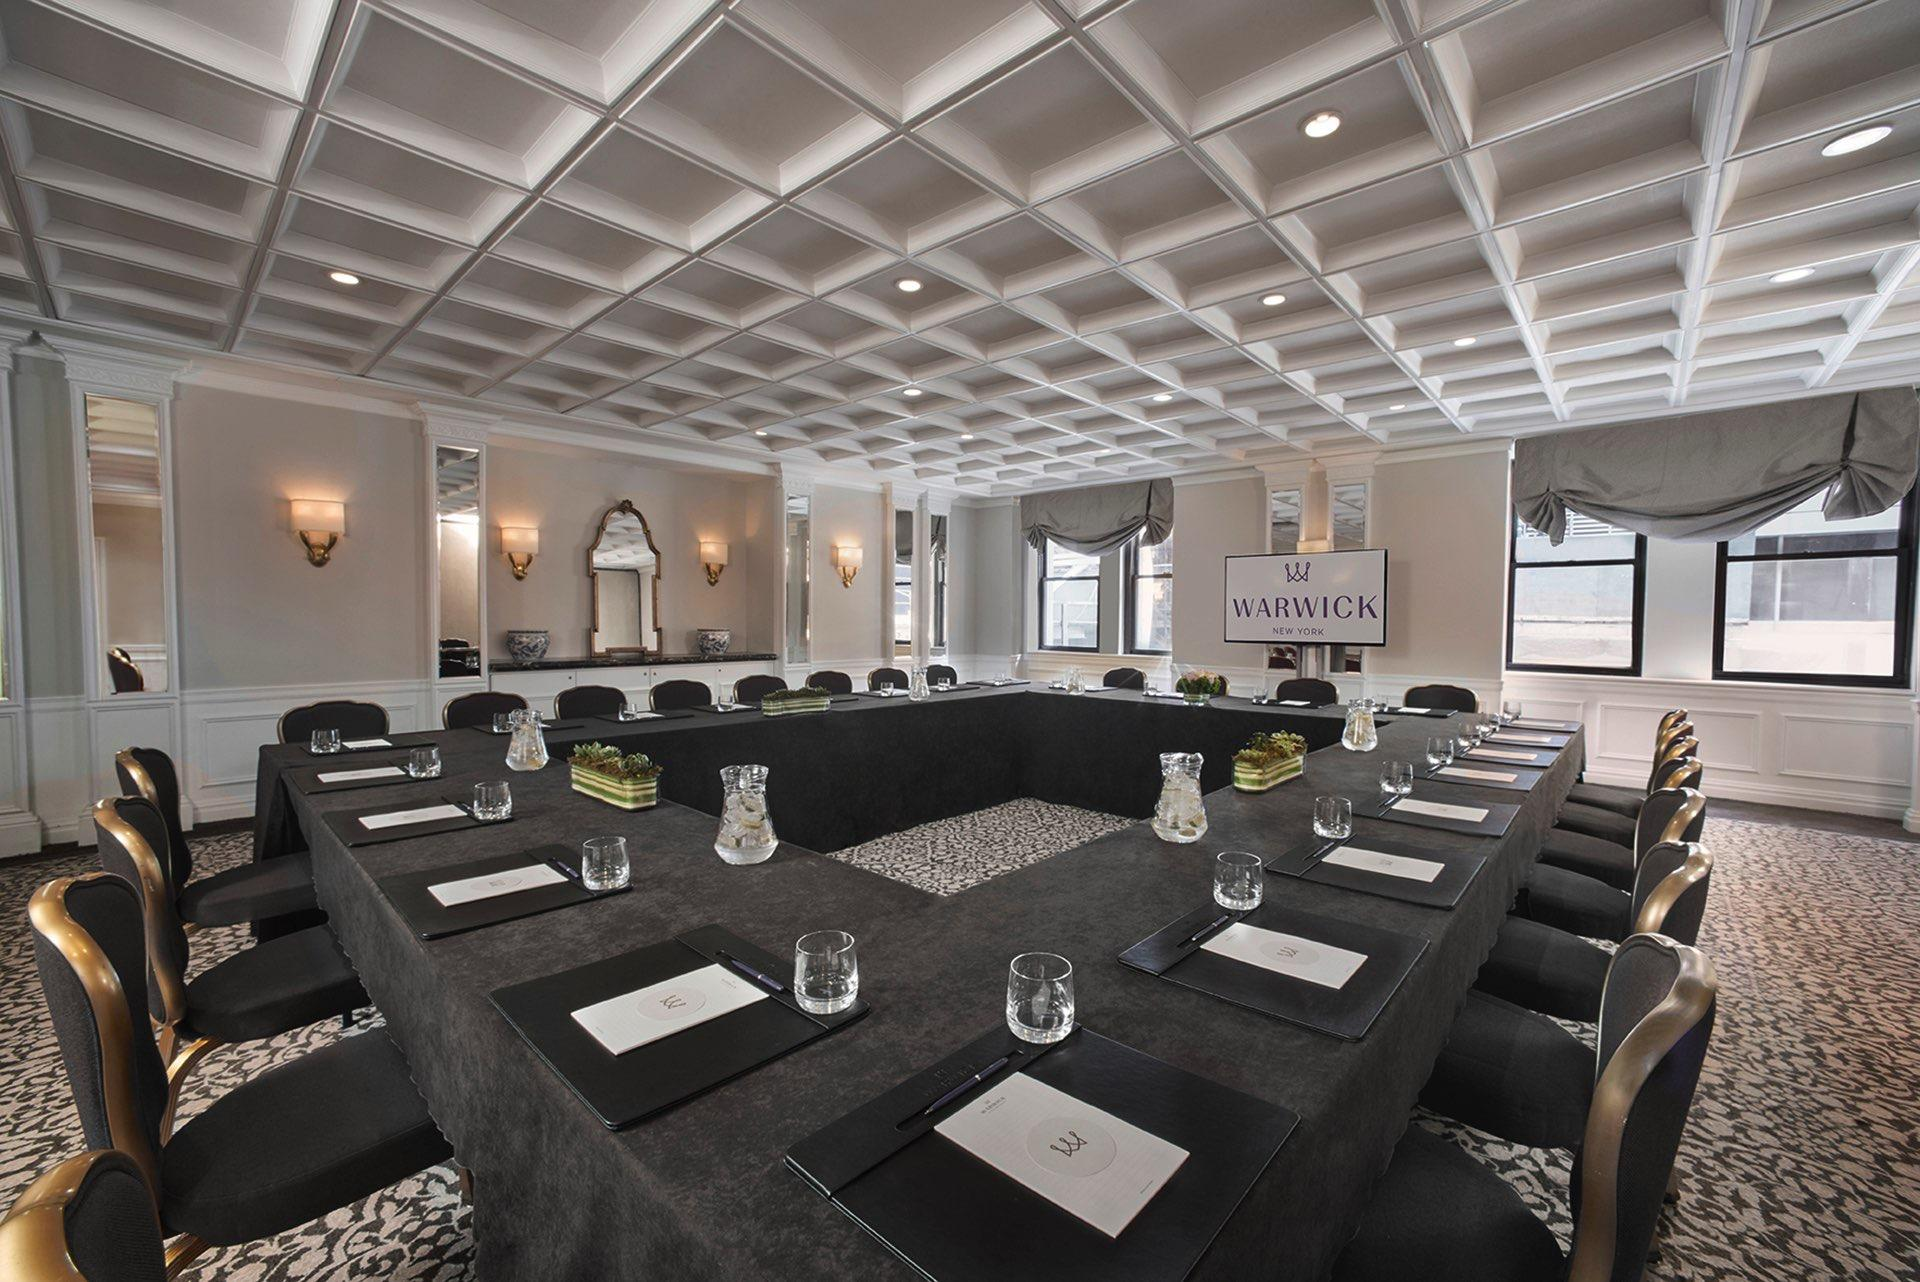 Oxford Meeting Room Boardroom at Warwick New York